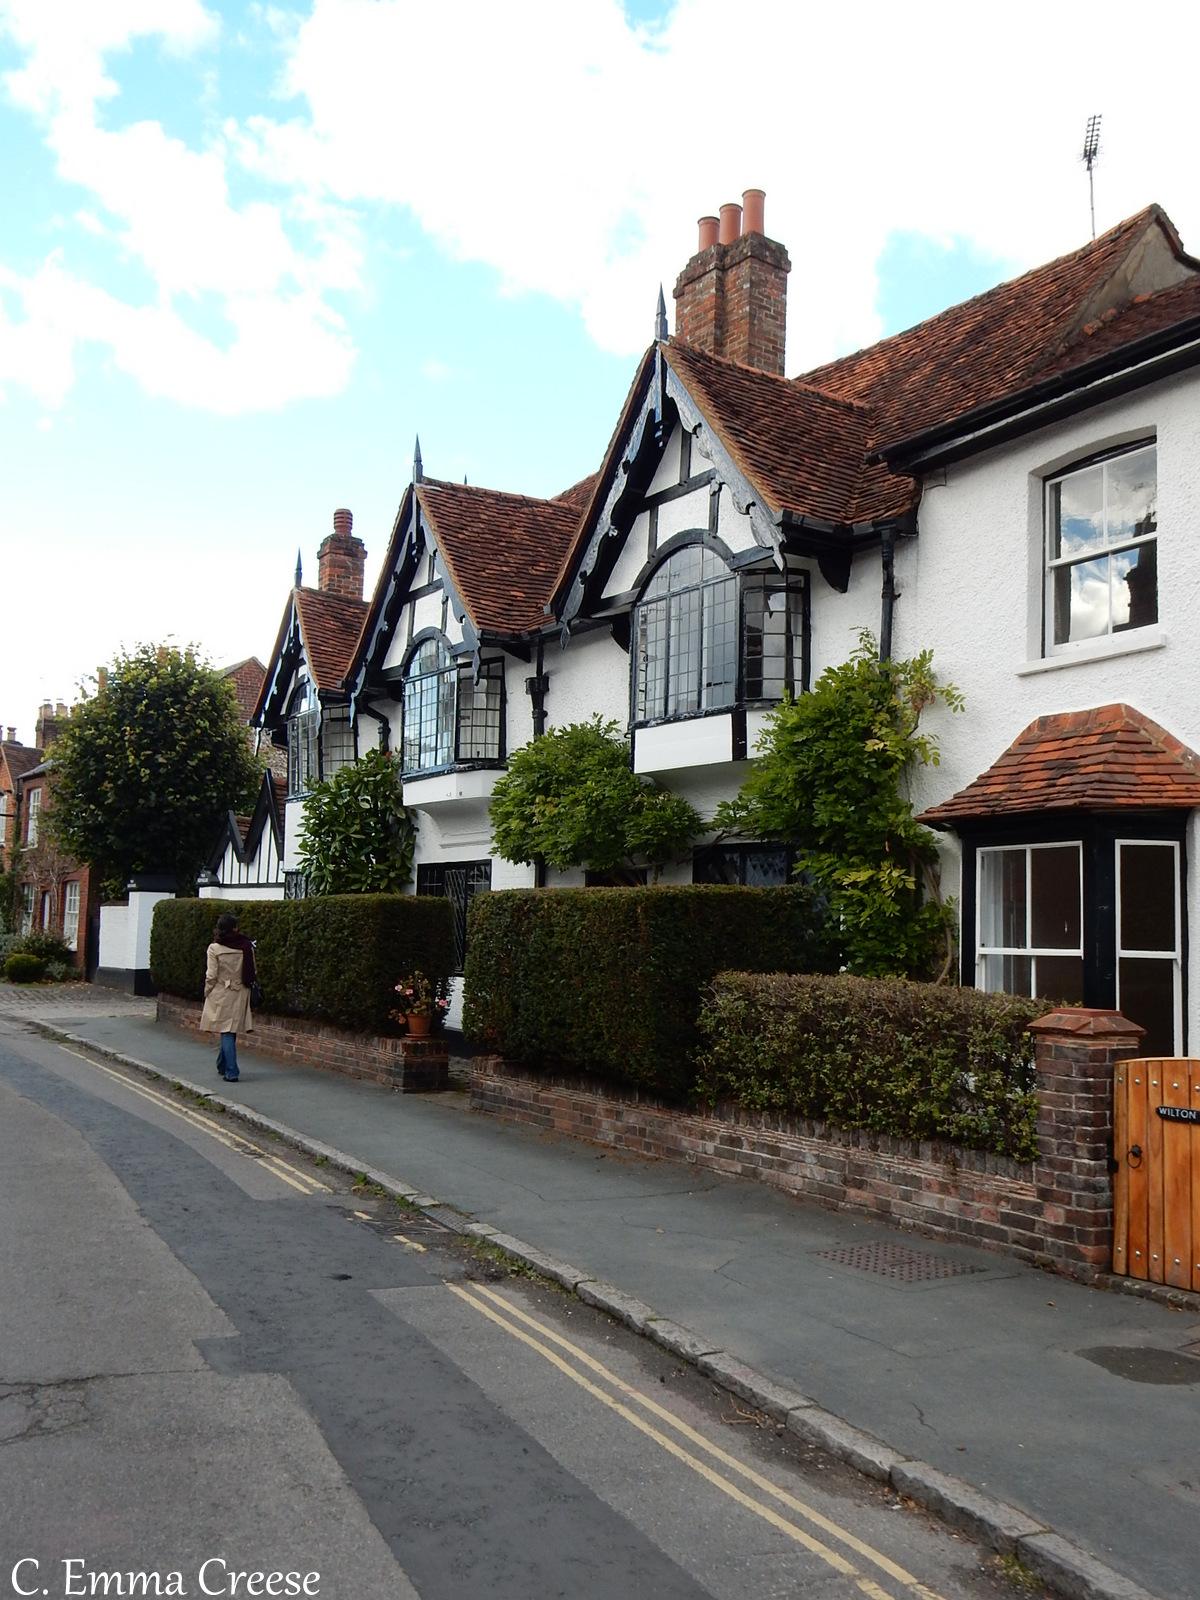 Roald Dahl Museum Literature Authors England Adventures of a London Kiwi